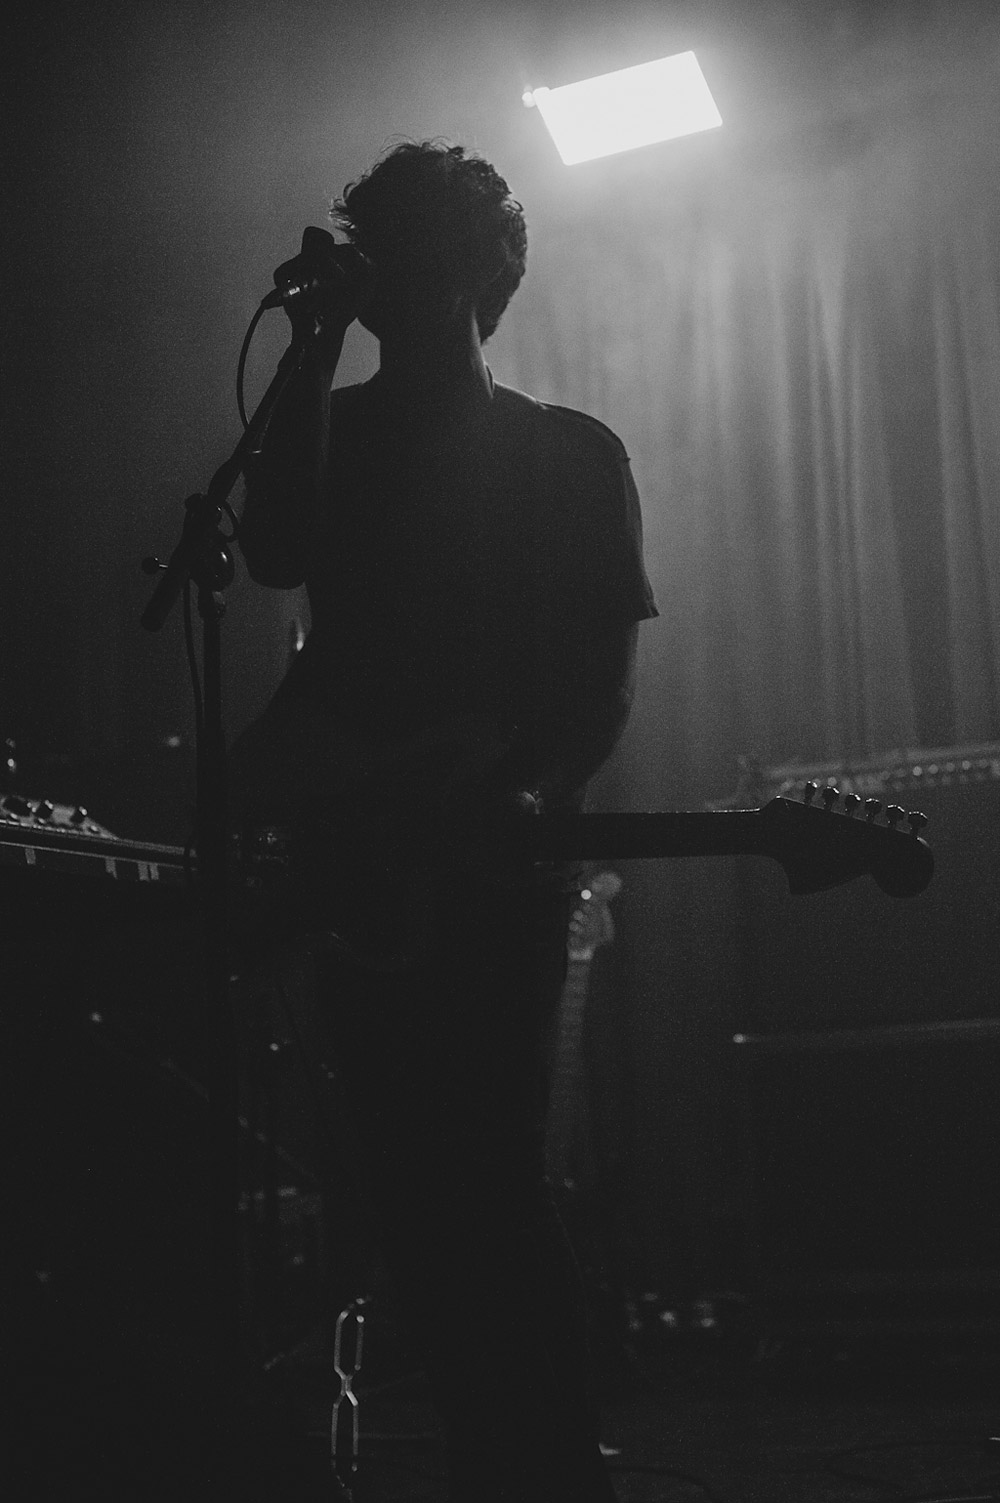 The Soft Moon @ Hoxton Square B&K - 25/05/15